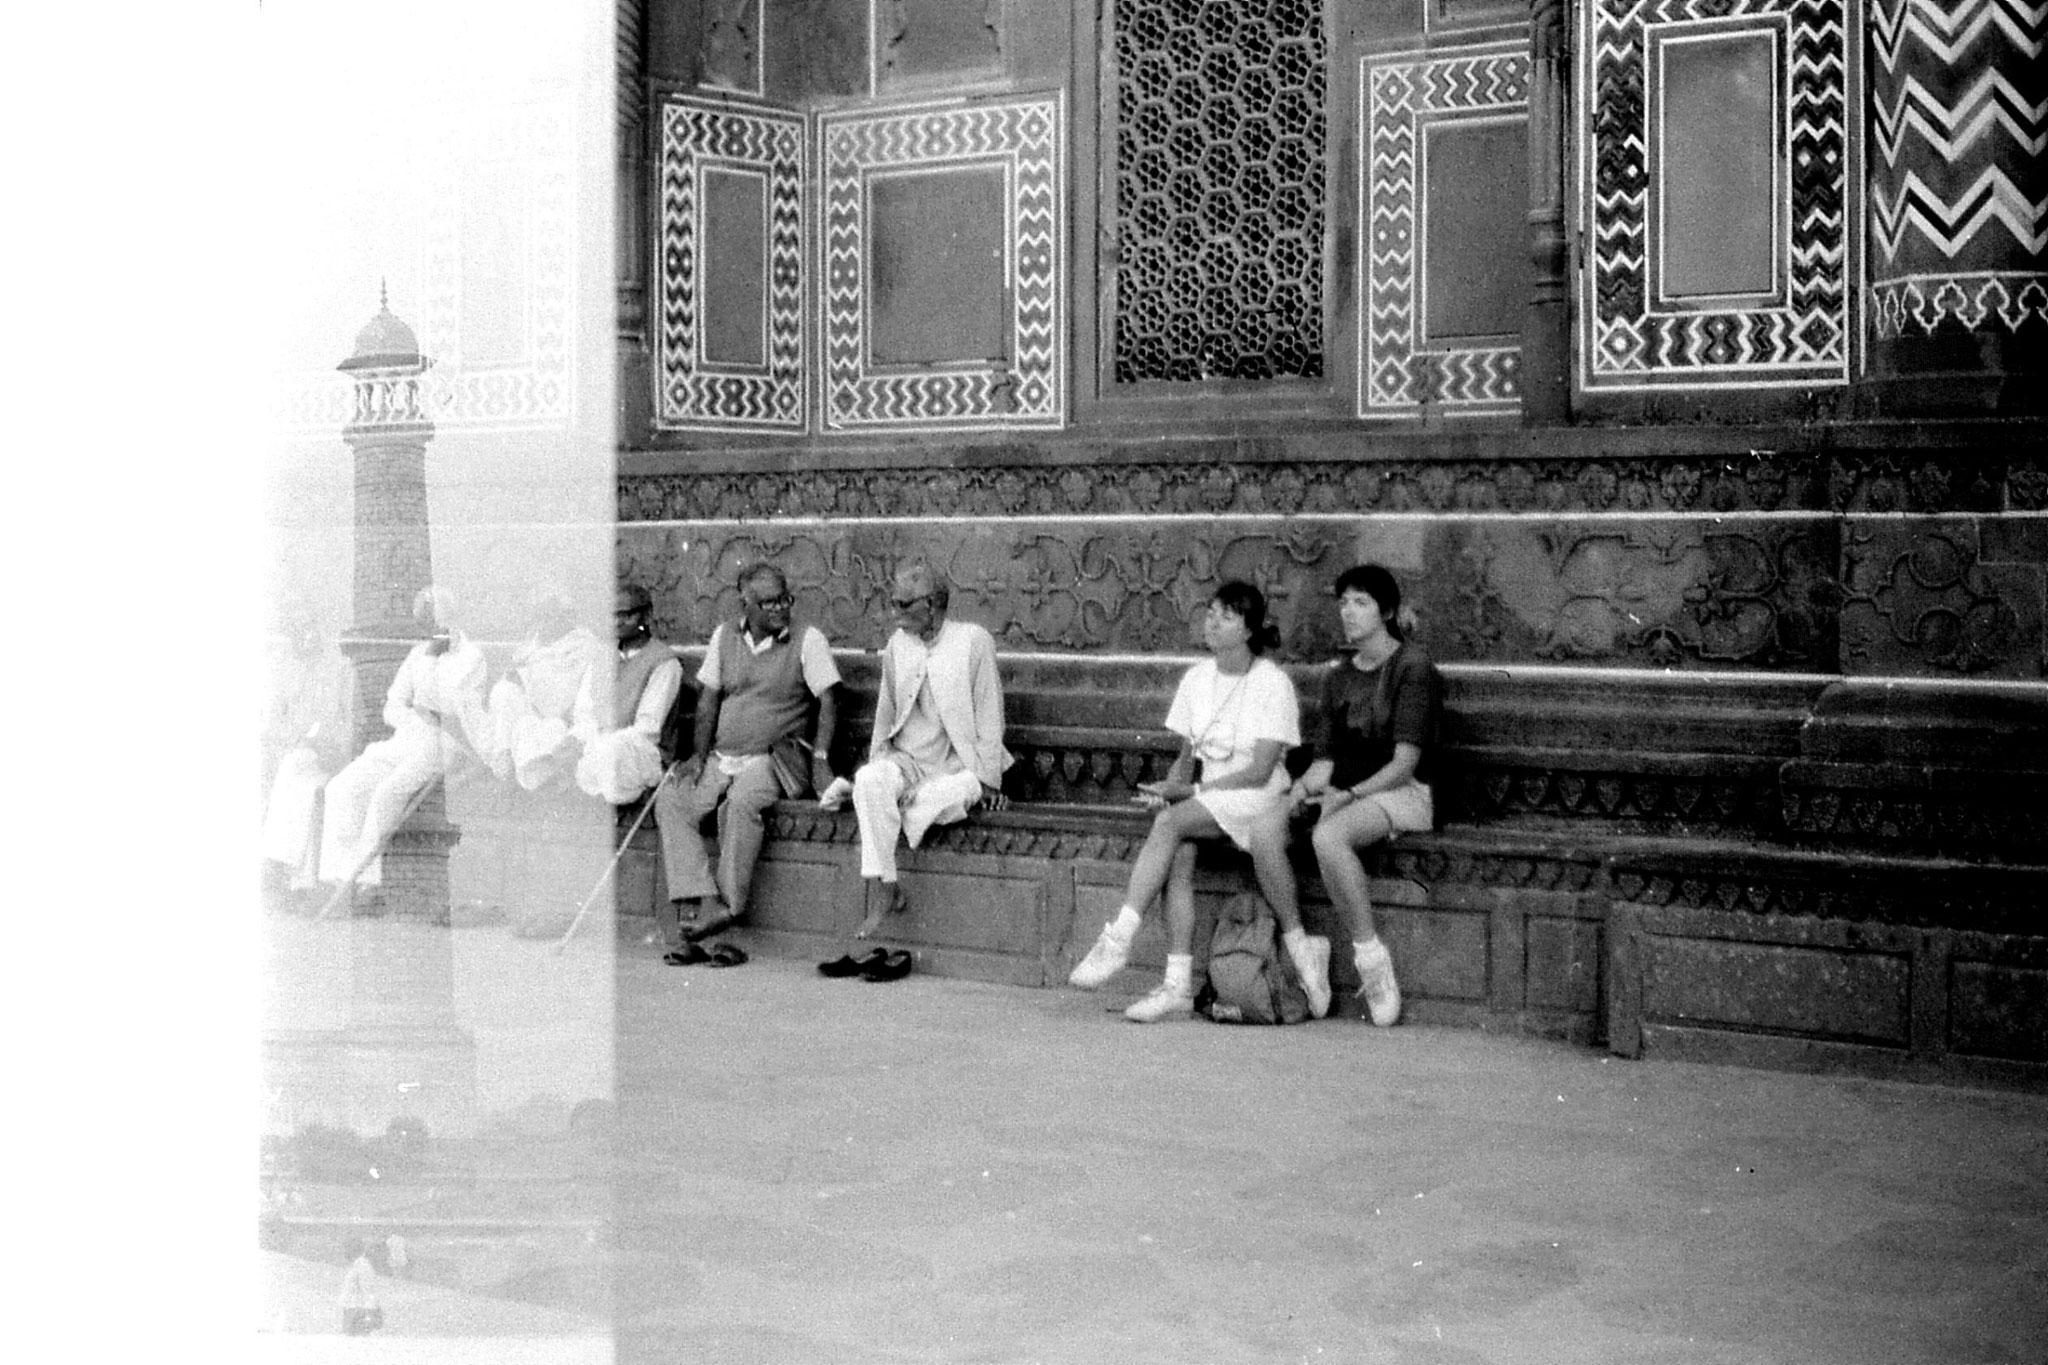 30/3/90: 33: Agra Taj Mahal